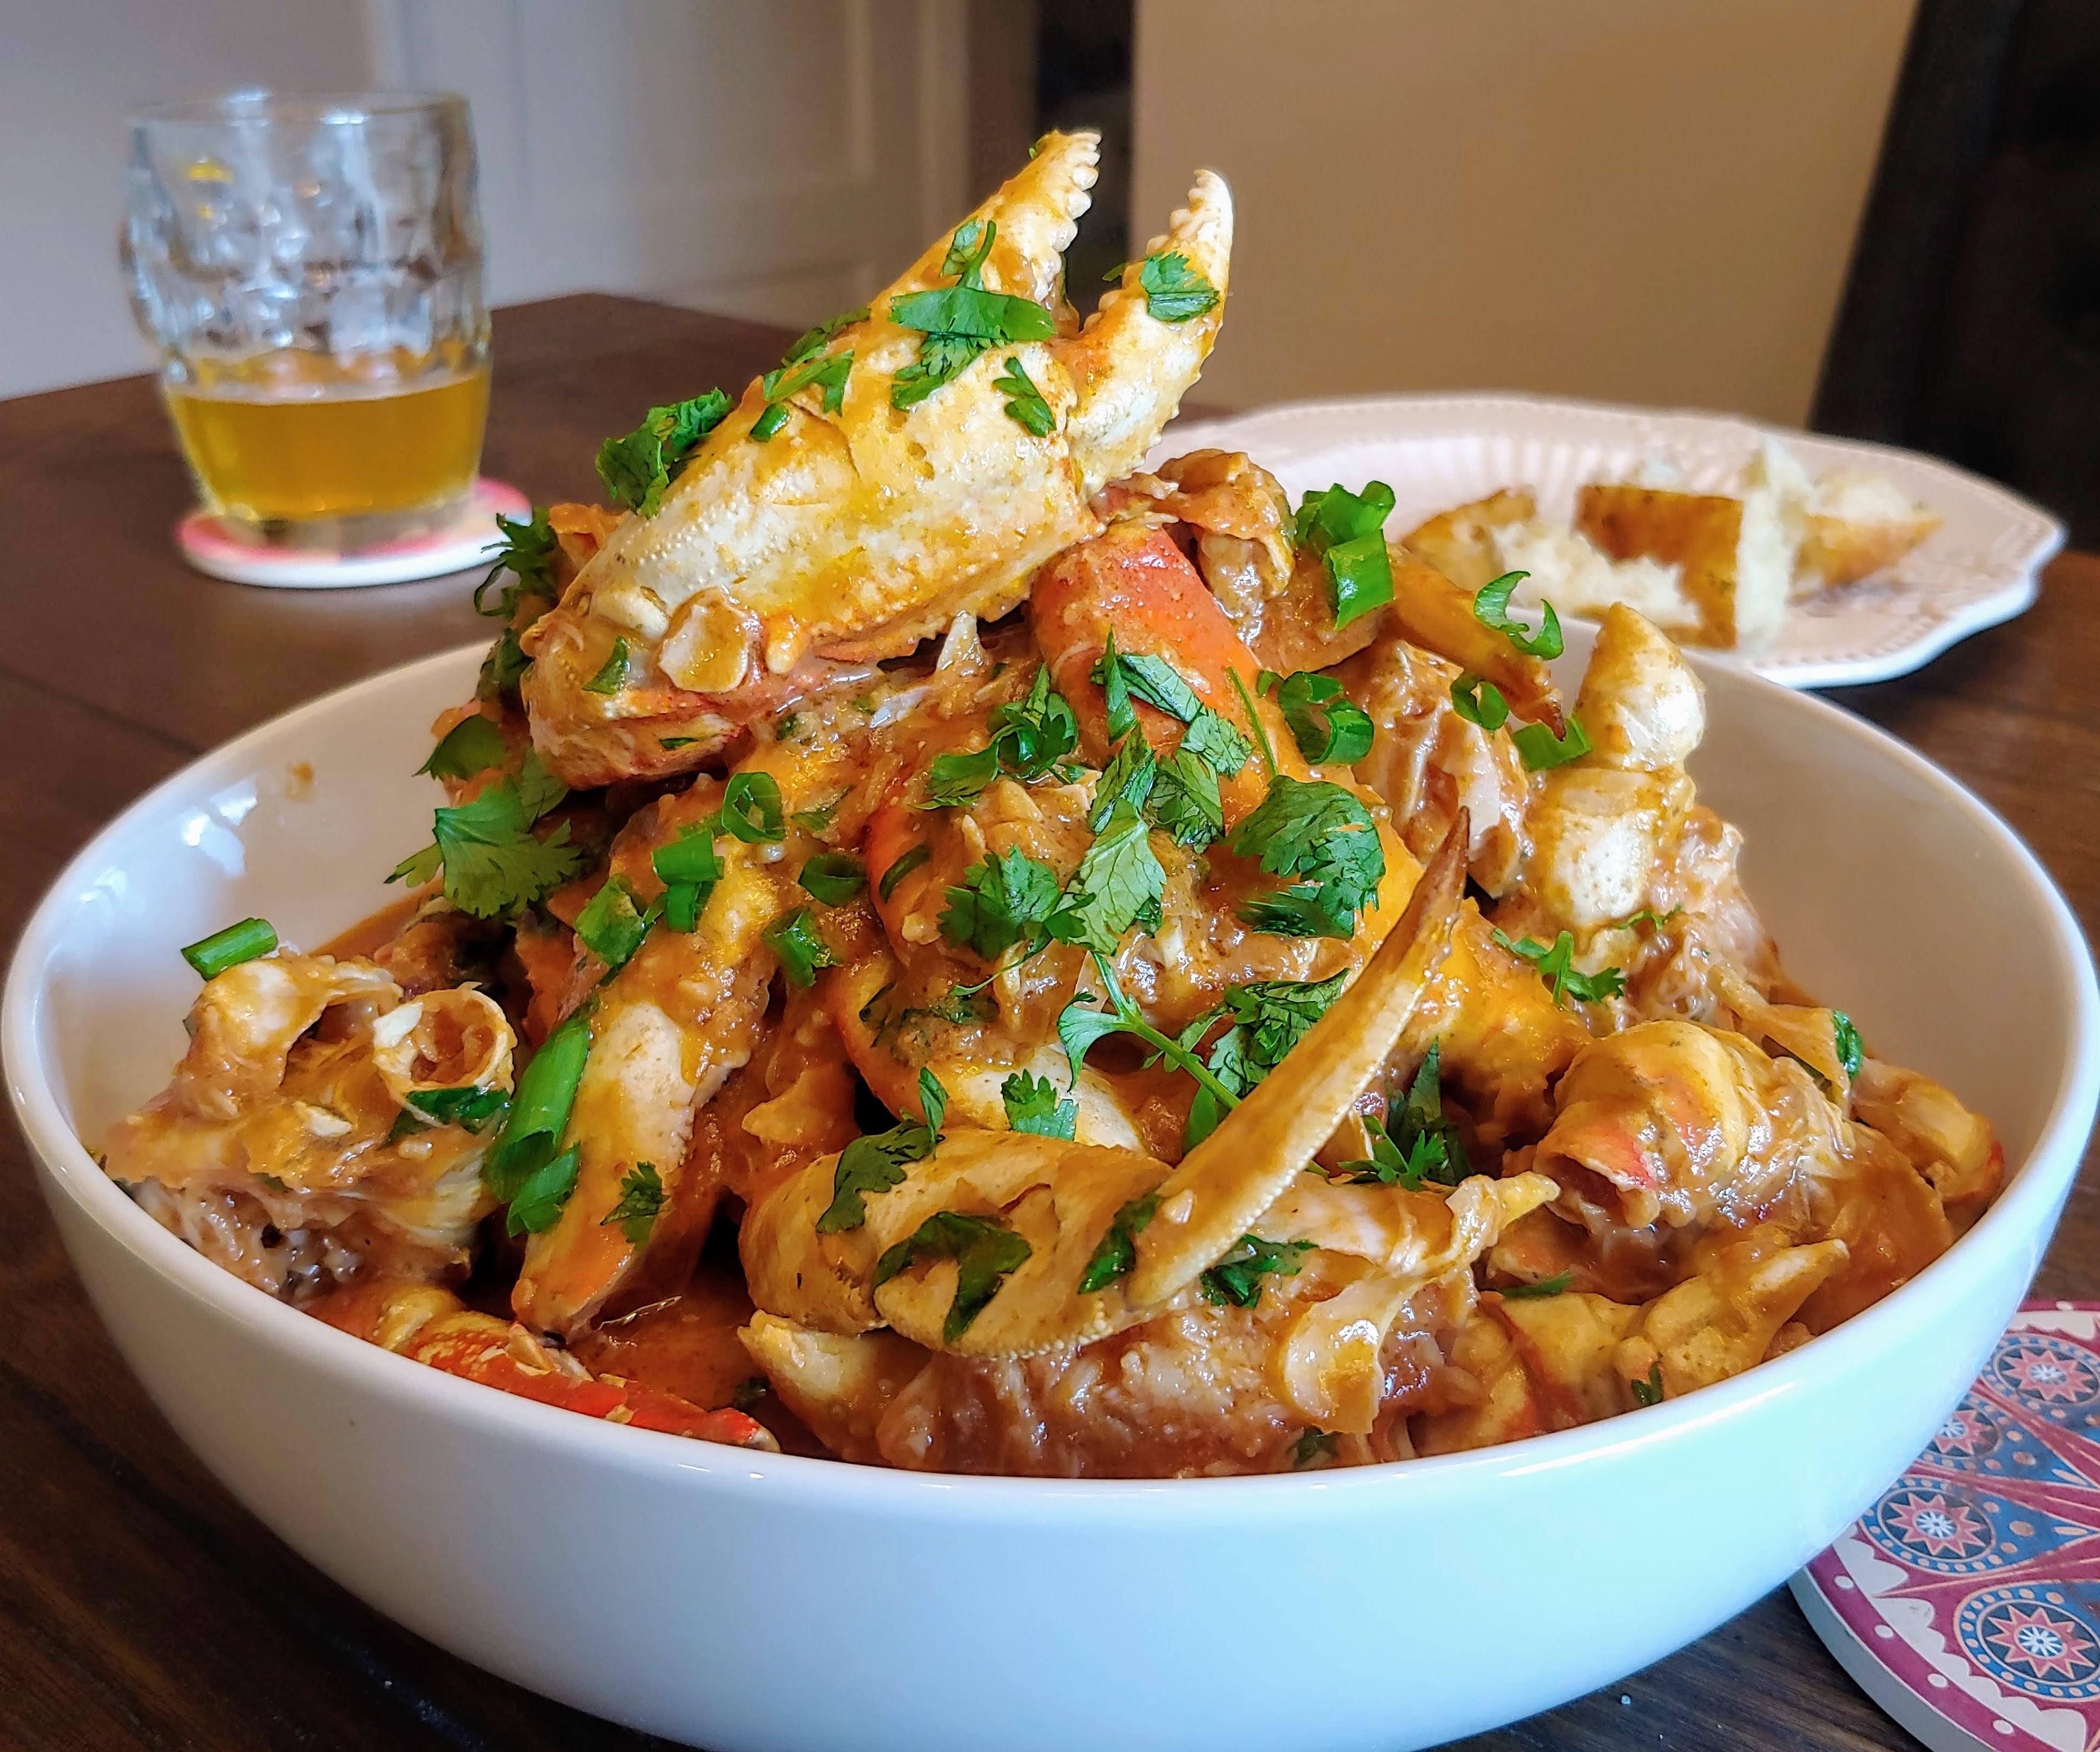 Singapore Chili Crabs Dolly Slugger